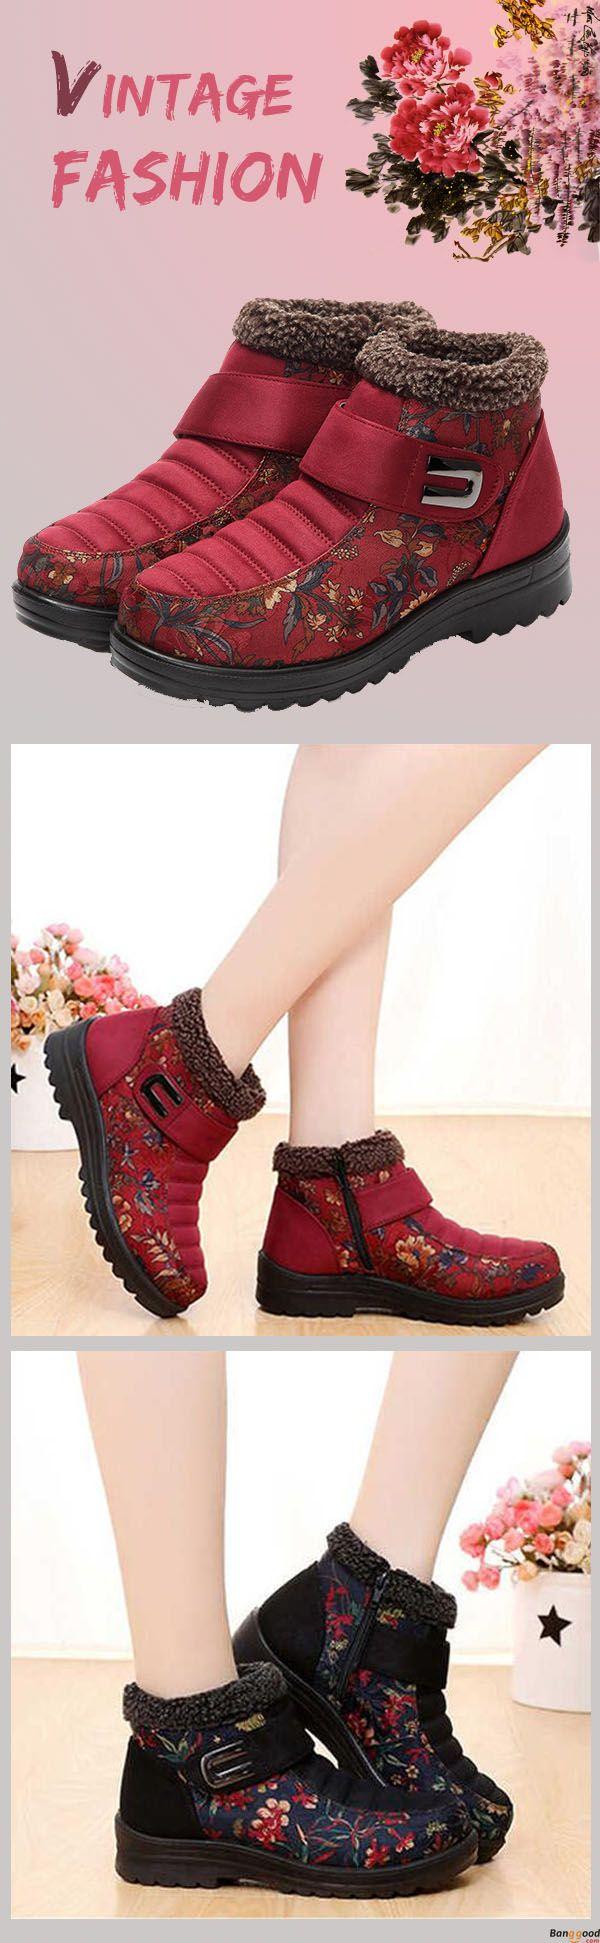 Muffin Fashion Metal Magic Stick Wild Sandals for sale wdG7wrbnb